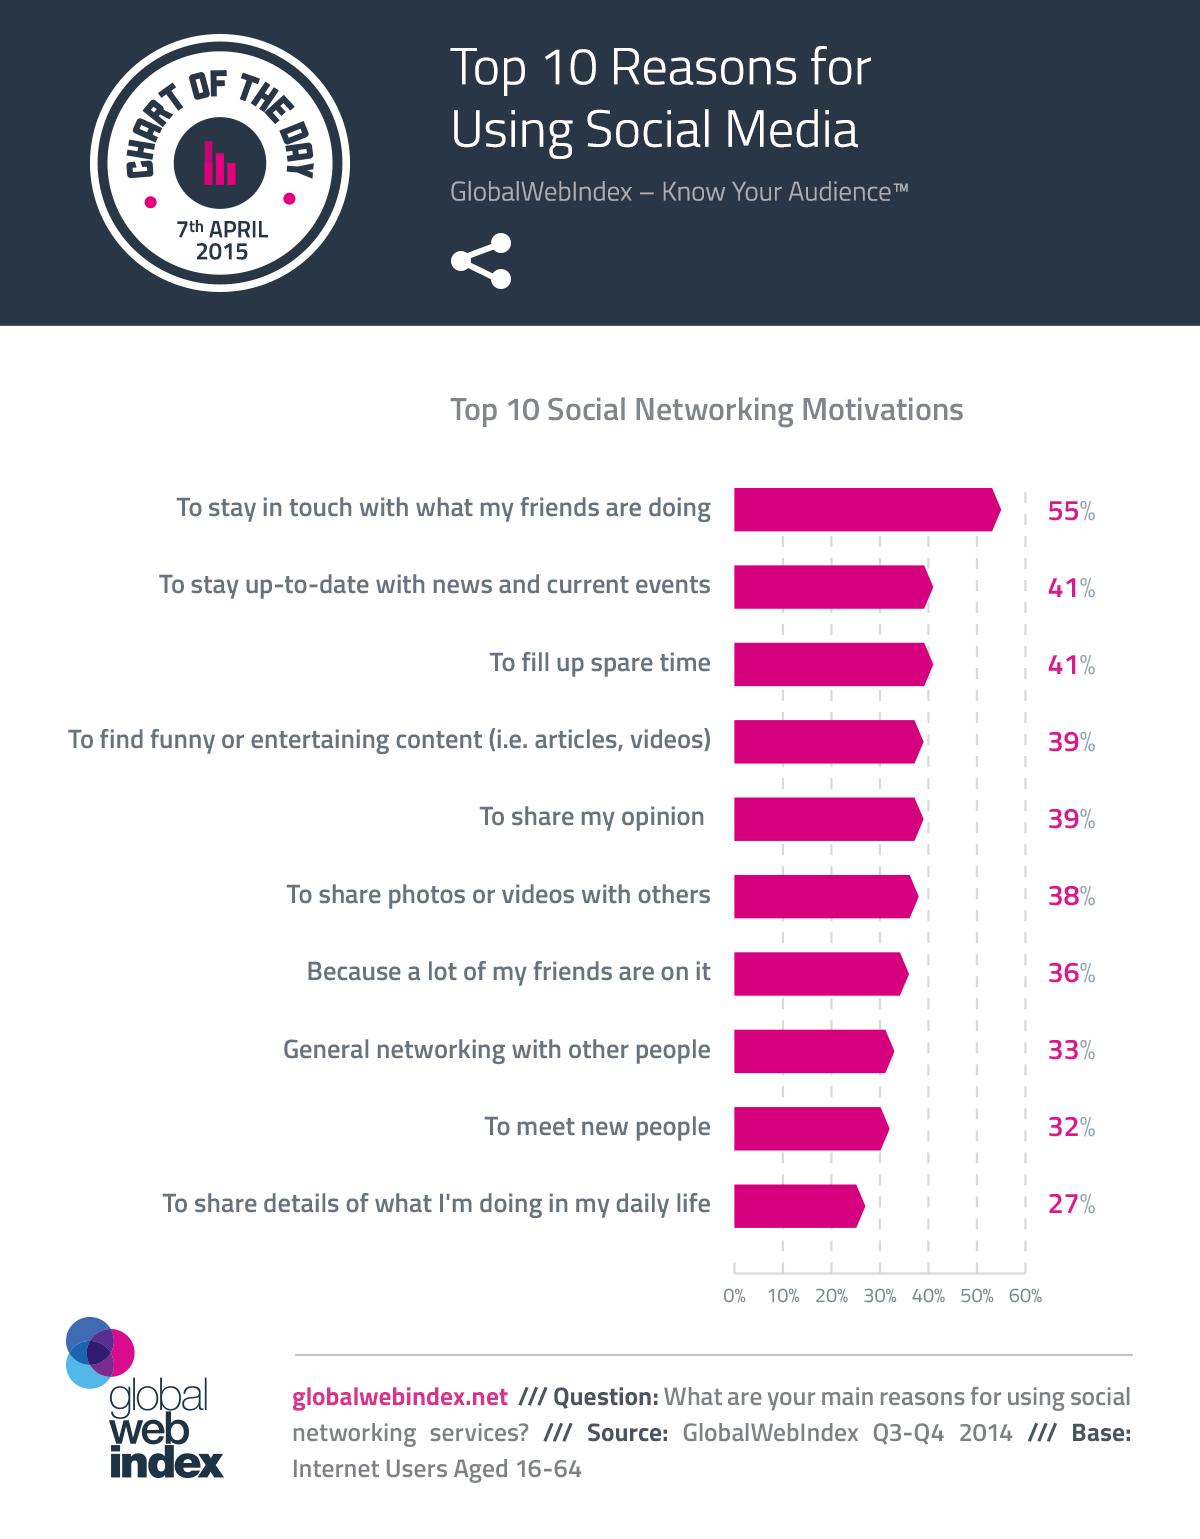 Top 10 Reasons for Using Social Media